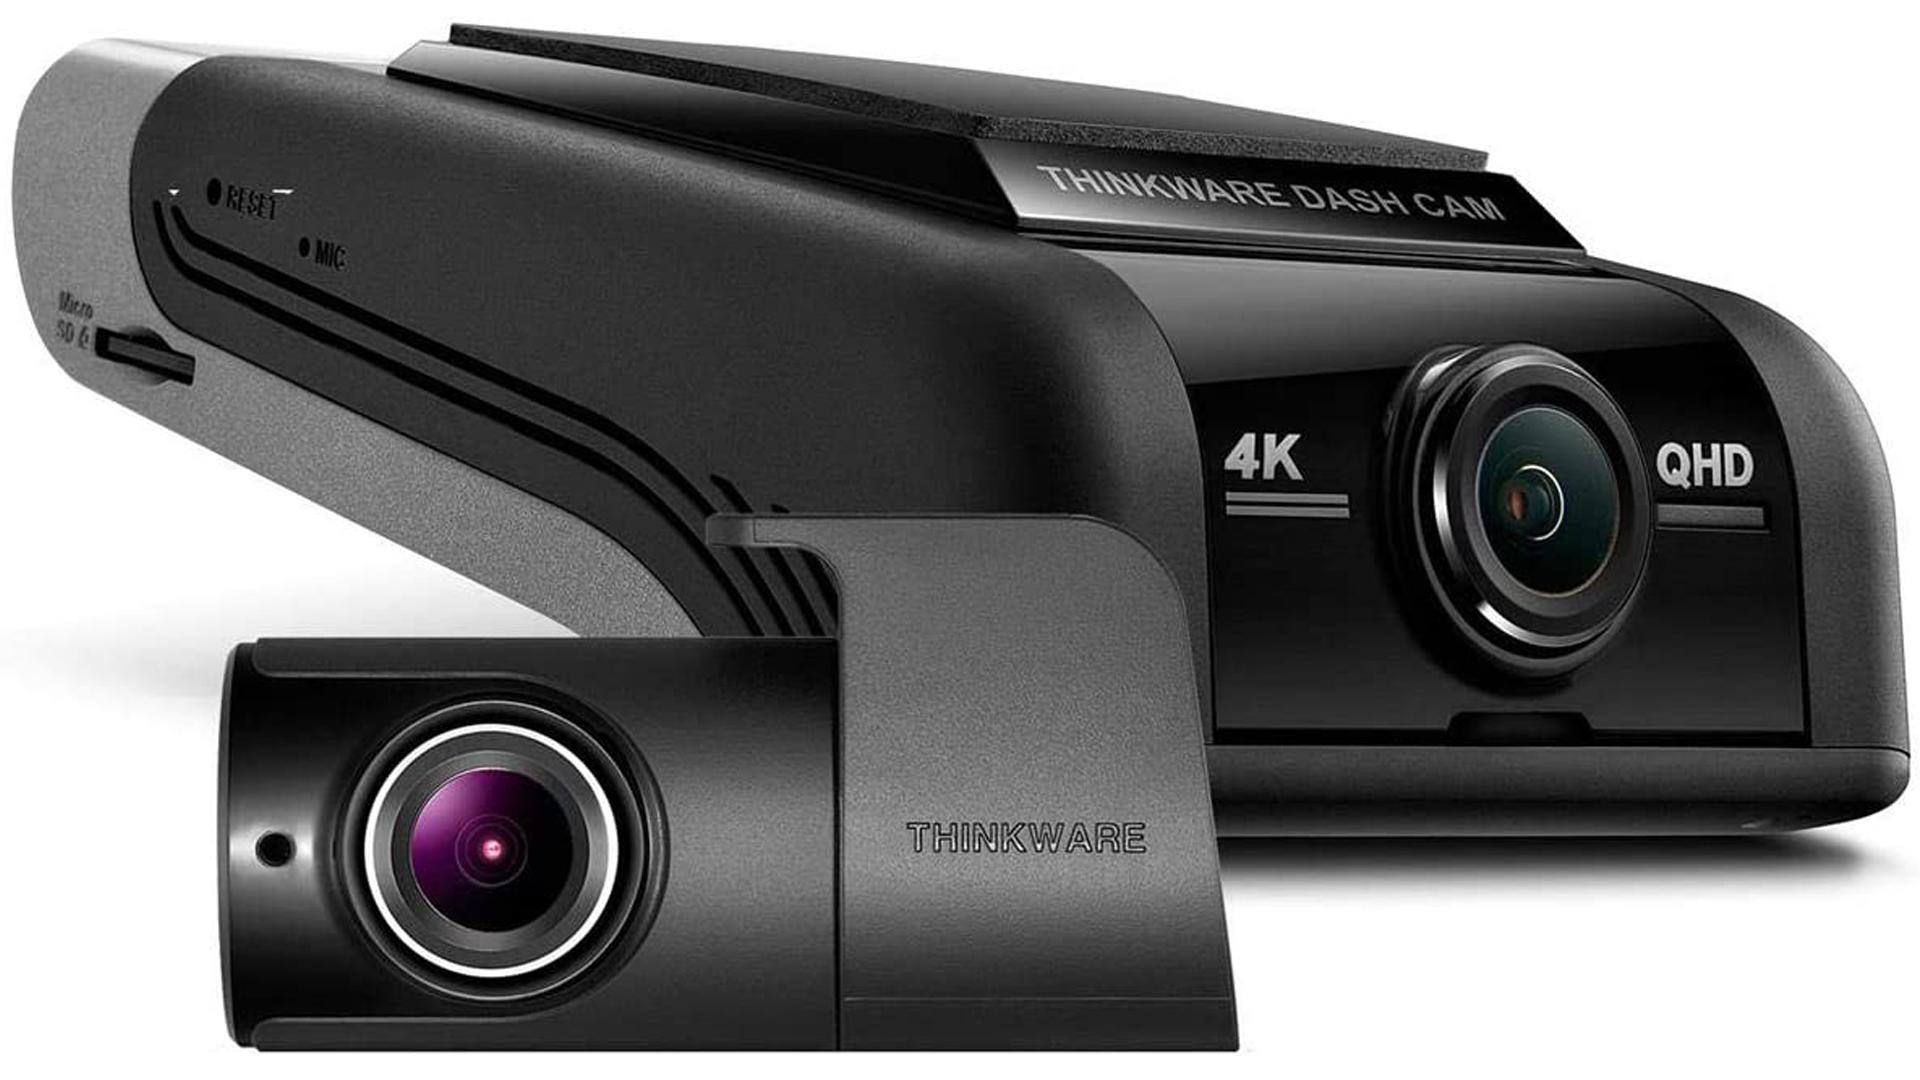 The Thinkware U1000 dash cam